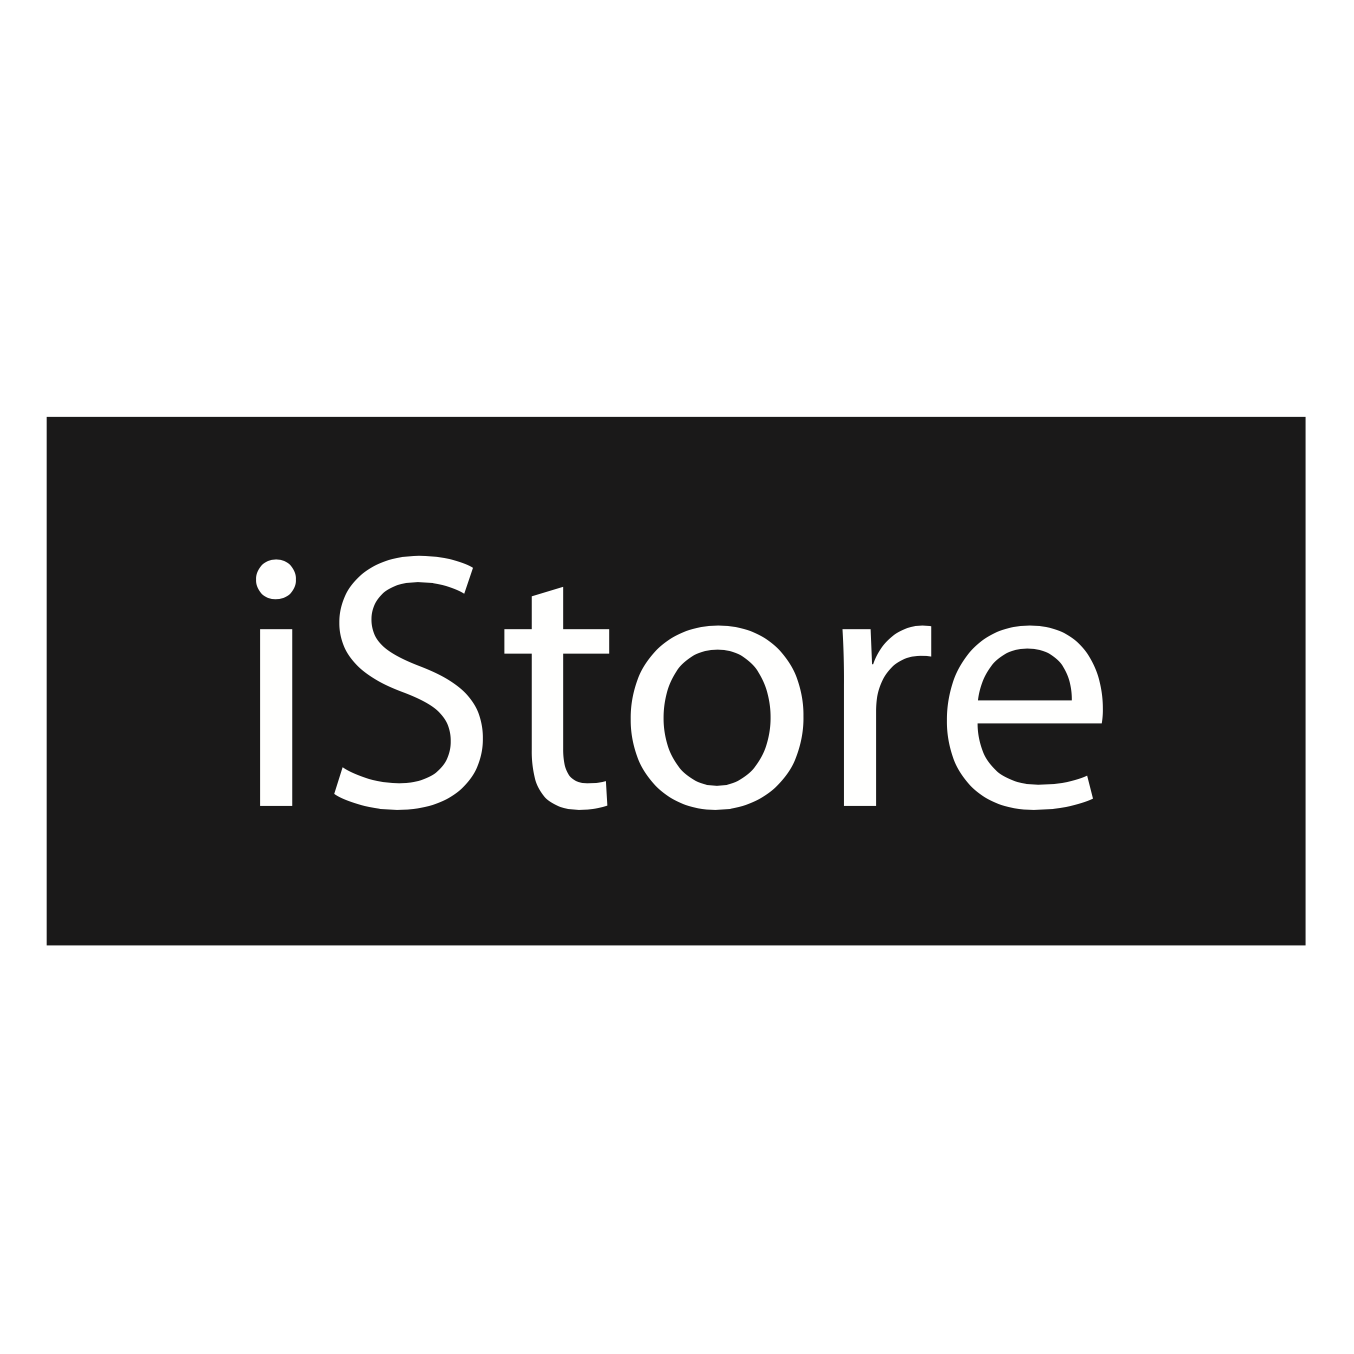 iPhone 7 Plus 256GB - Silver